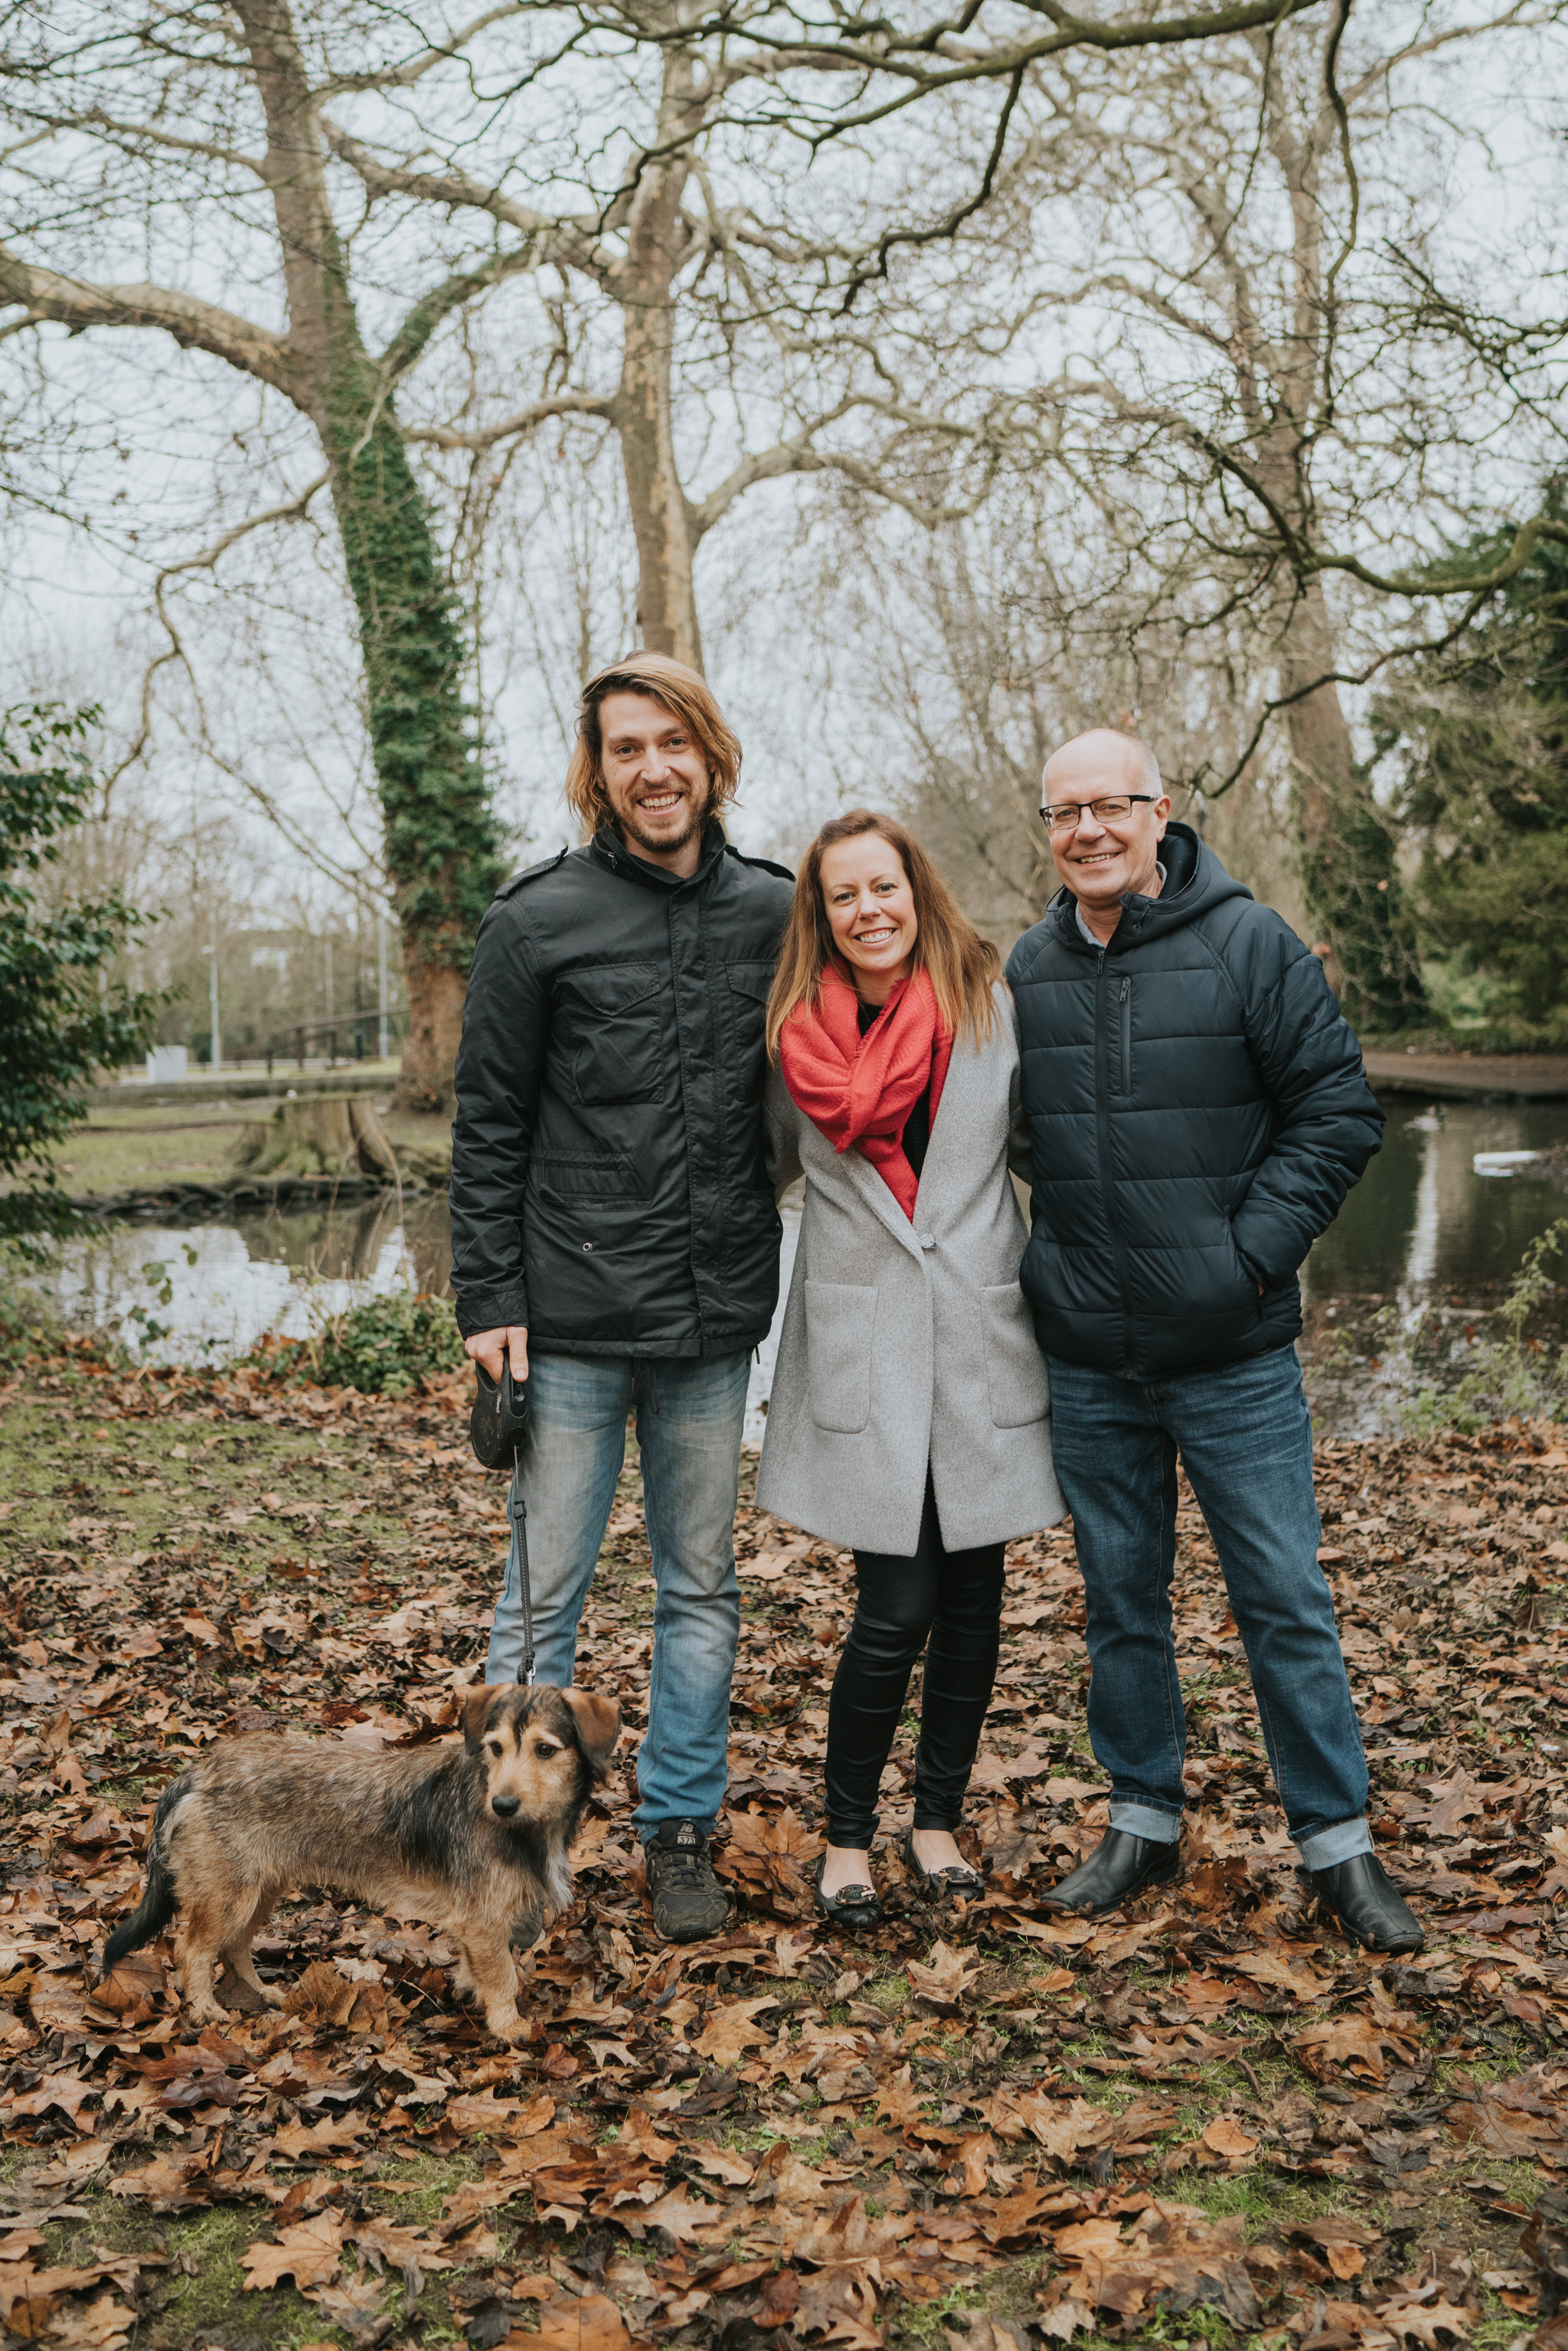 Hertfordshire-extended-family-session-grace-elizabeth-colchester-essex-alternative-wedding-photographer-suffolk-devon-norfolk (14 of 26).jpg